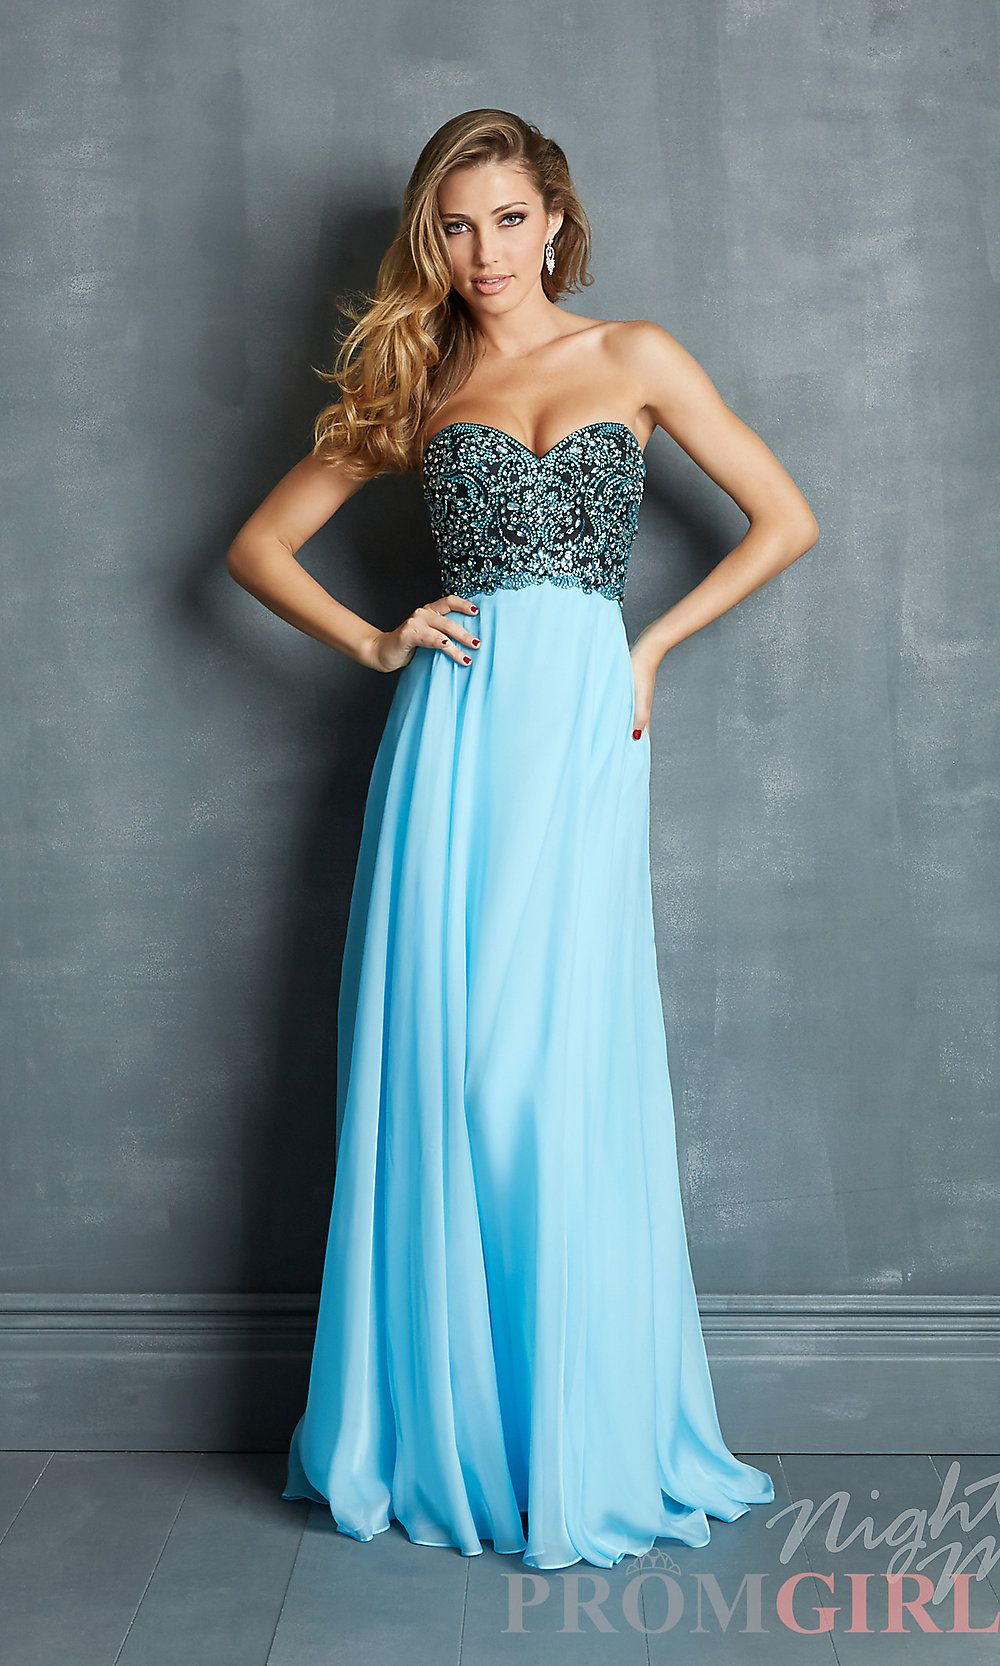 Strapless night moves prom dress fashion pinterest night moves